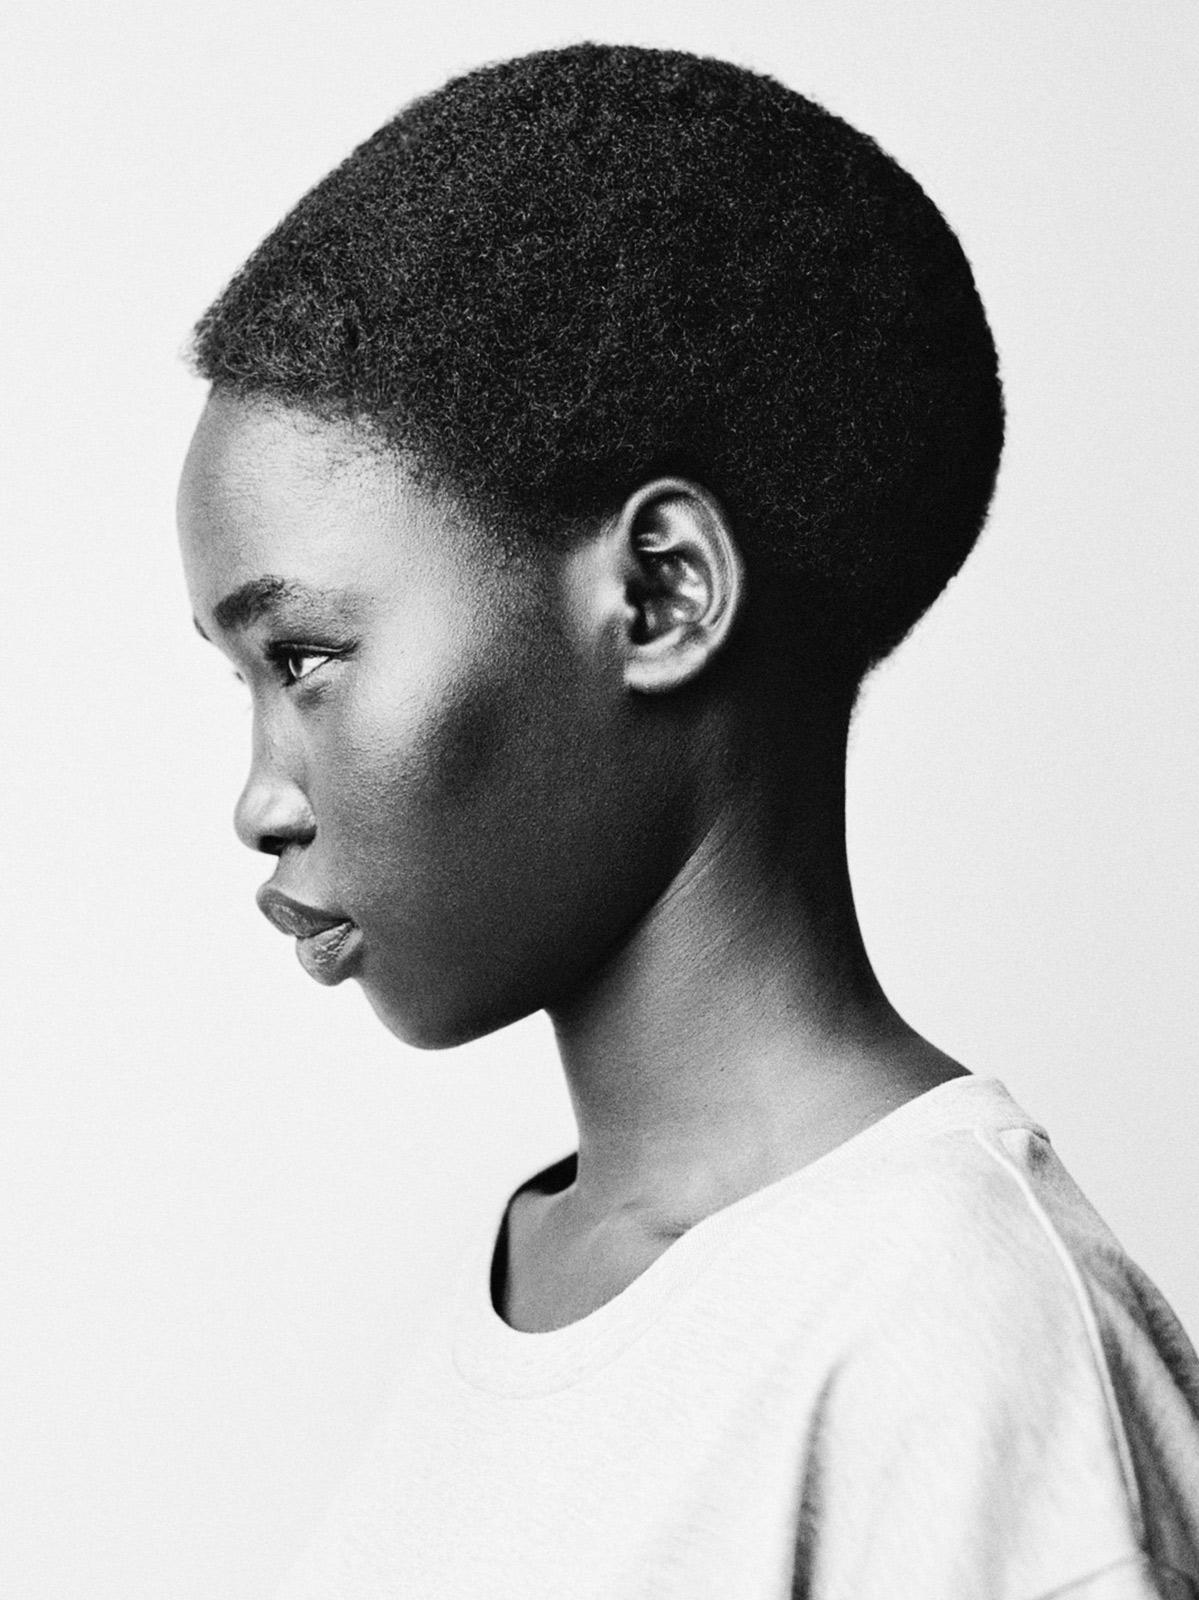 Meet the emerging models reinvigorating a shaken fashion world